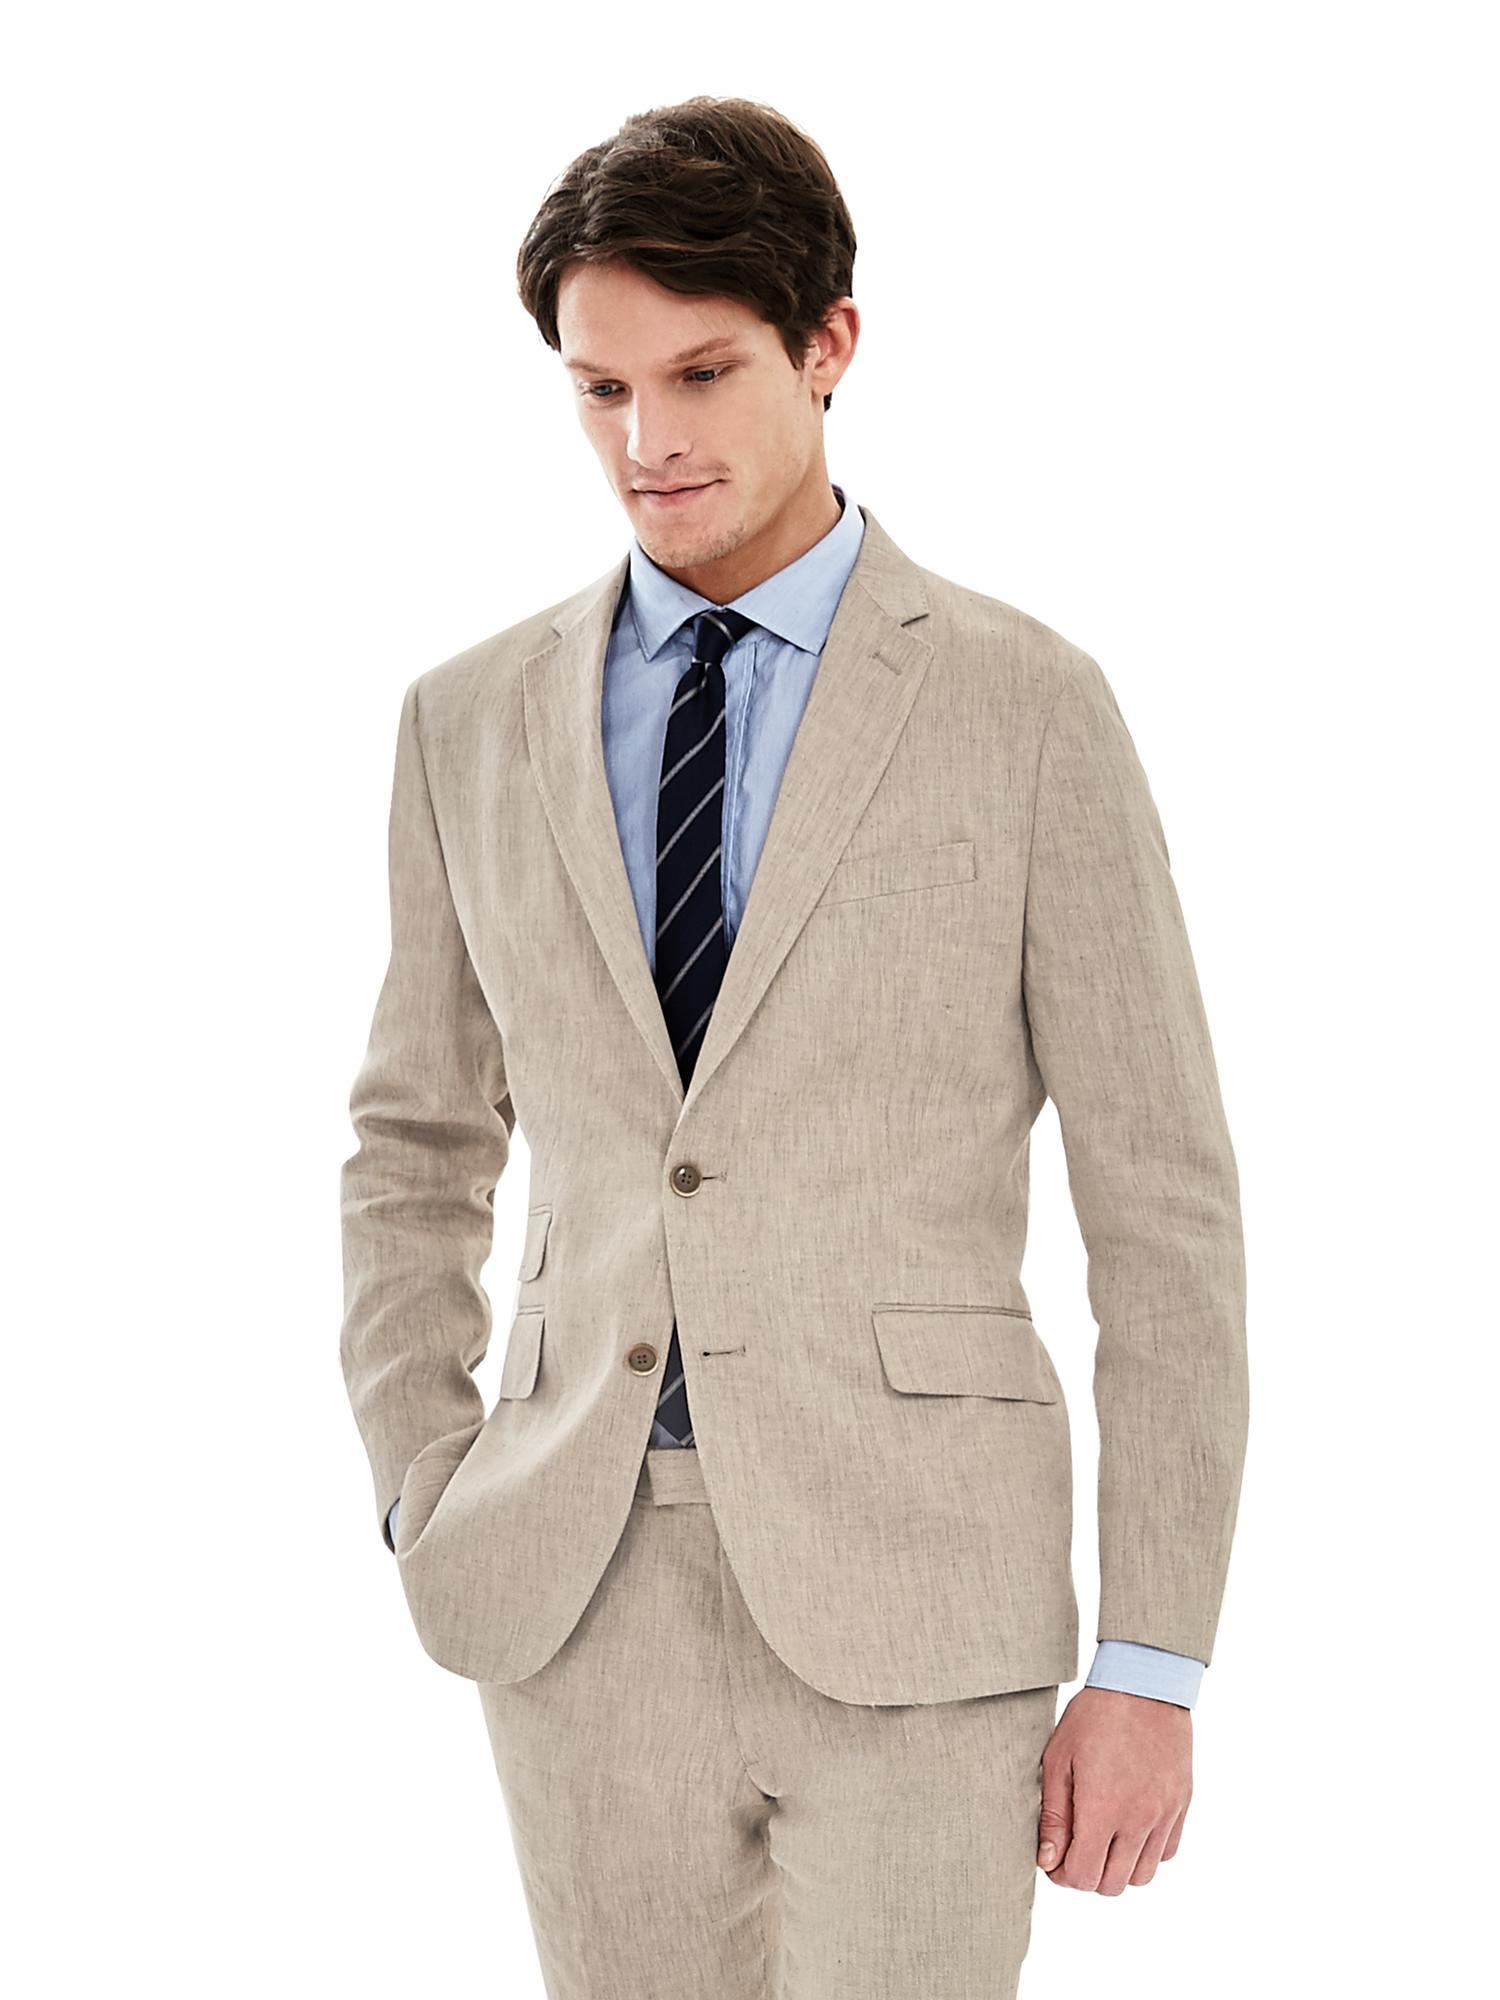 5a352620b534 Lyst - Banana Republic Modern Slim Khaki Linen Suit Jacket in ...